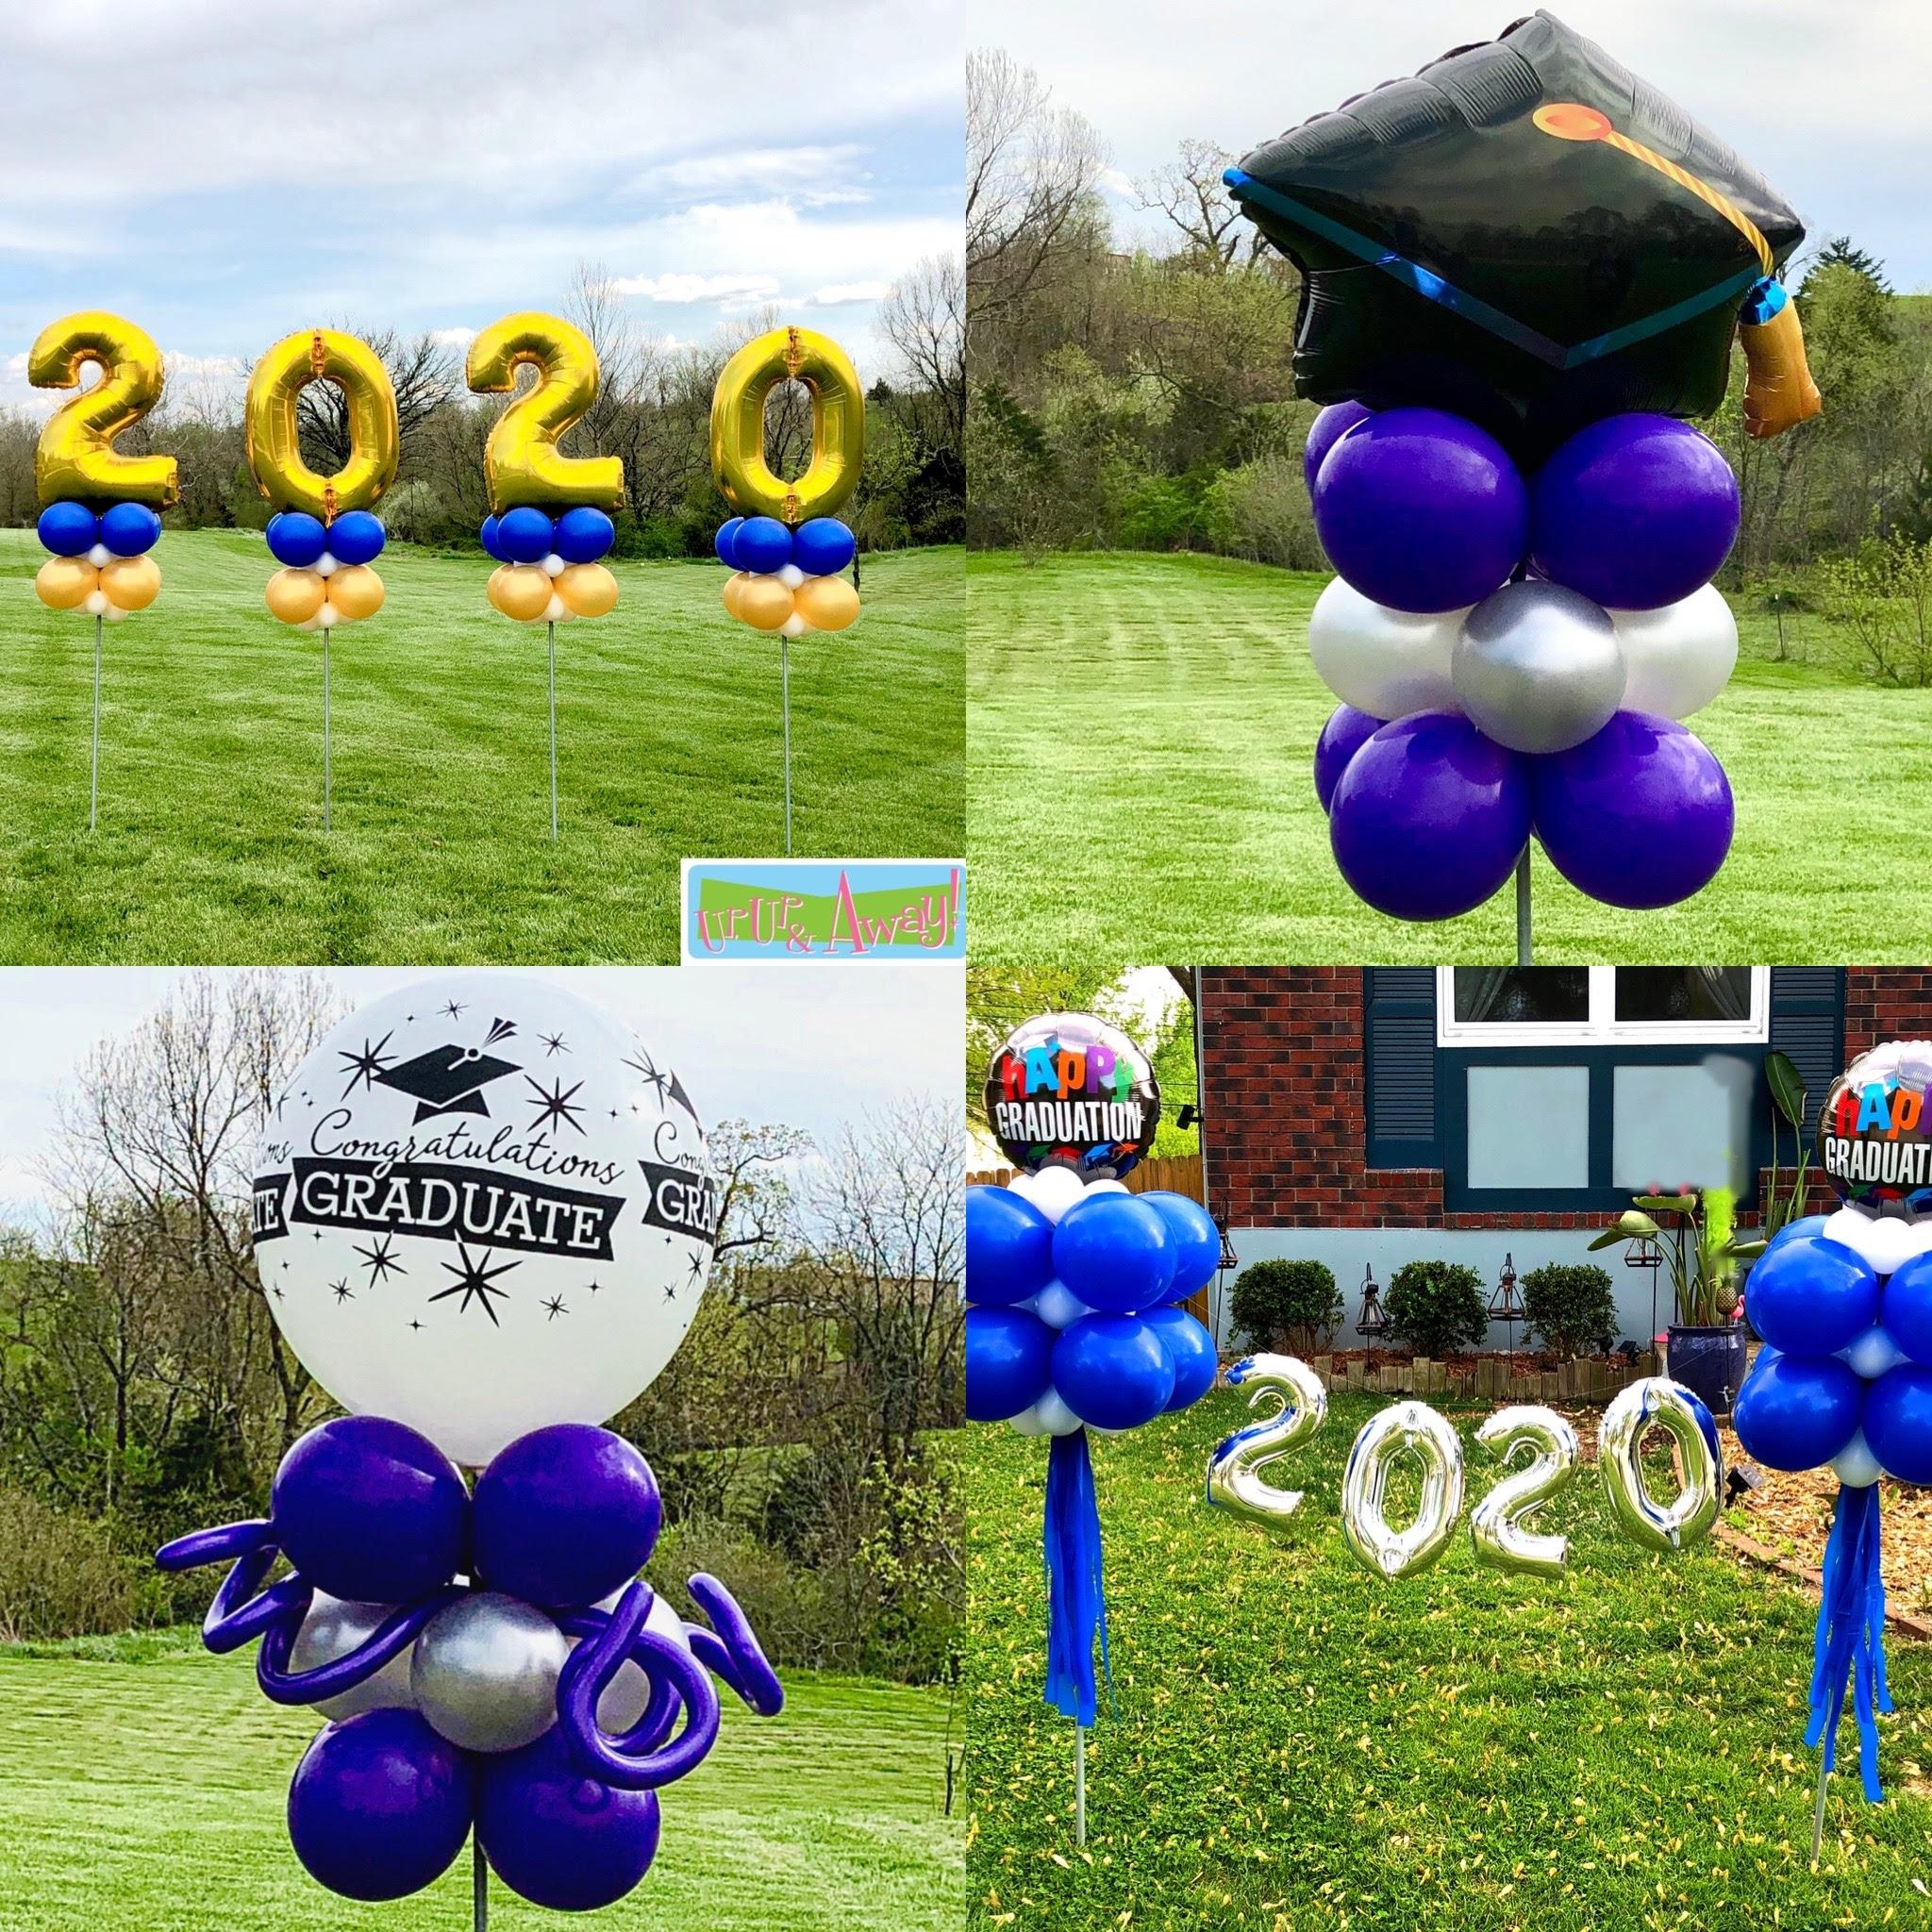 Graduation Yard Art Kansas City Balloons | Up, Up & Away! Balloons